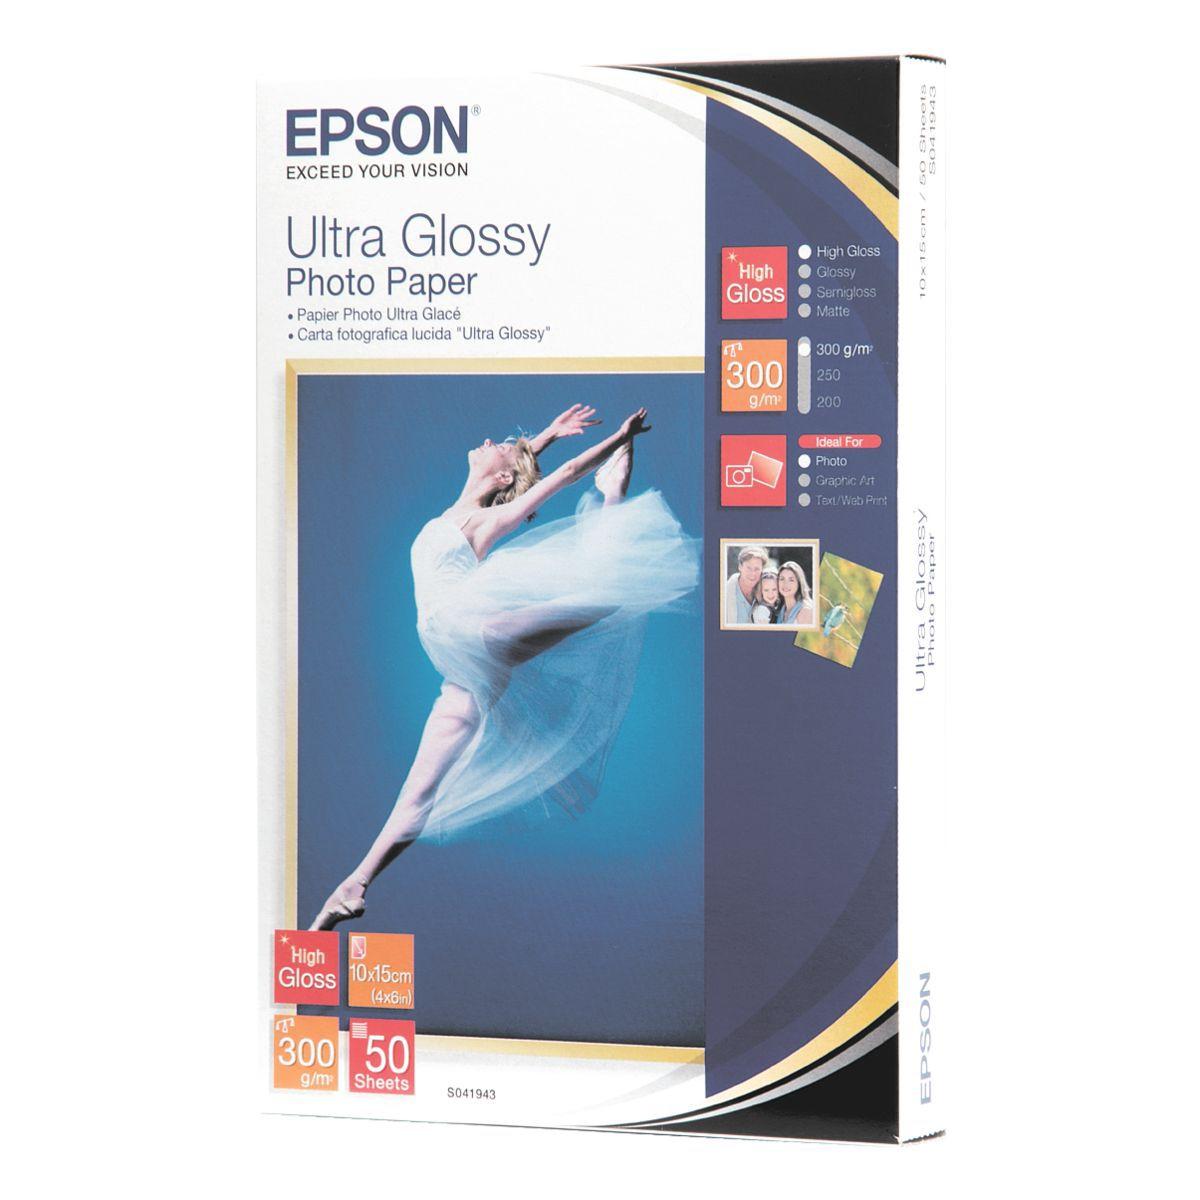 Epson Fotopapier �Ultra Glossy Photo Paper�, 50 Blatt